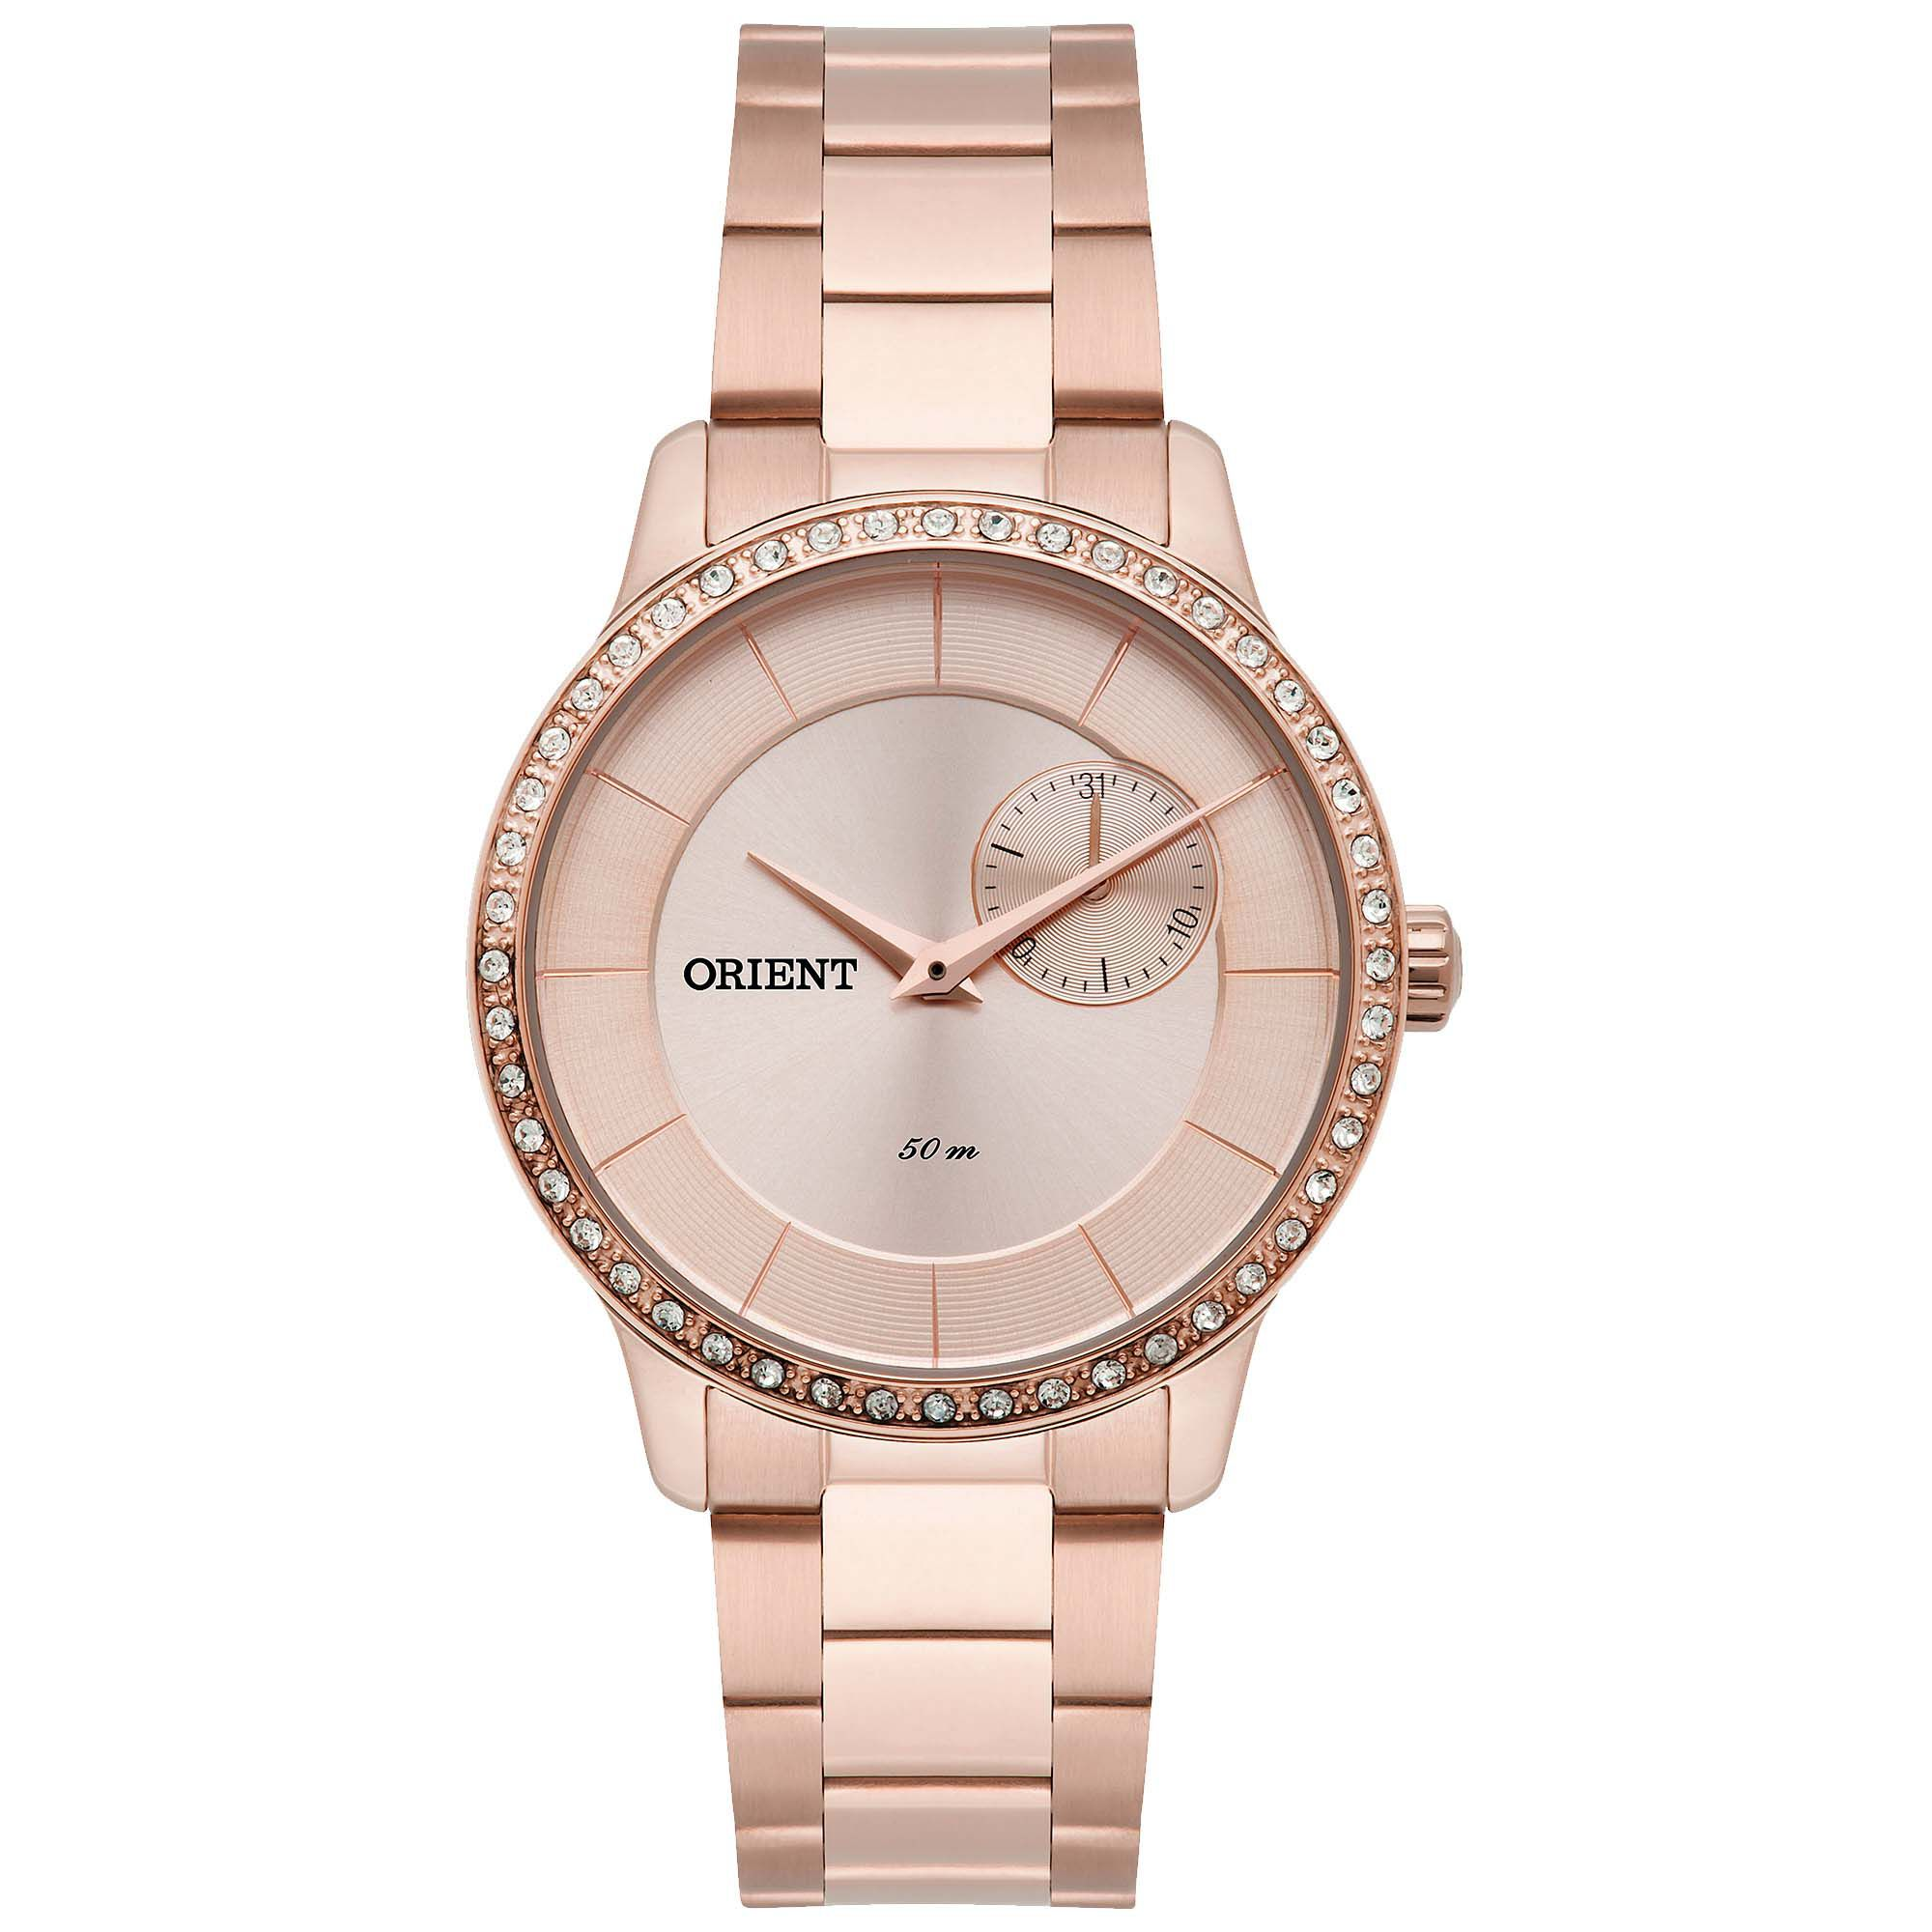 Relógio Feminino Orient FRSSM025 R1RX